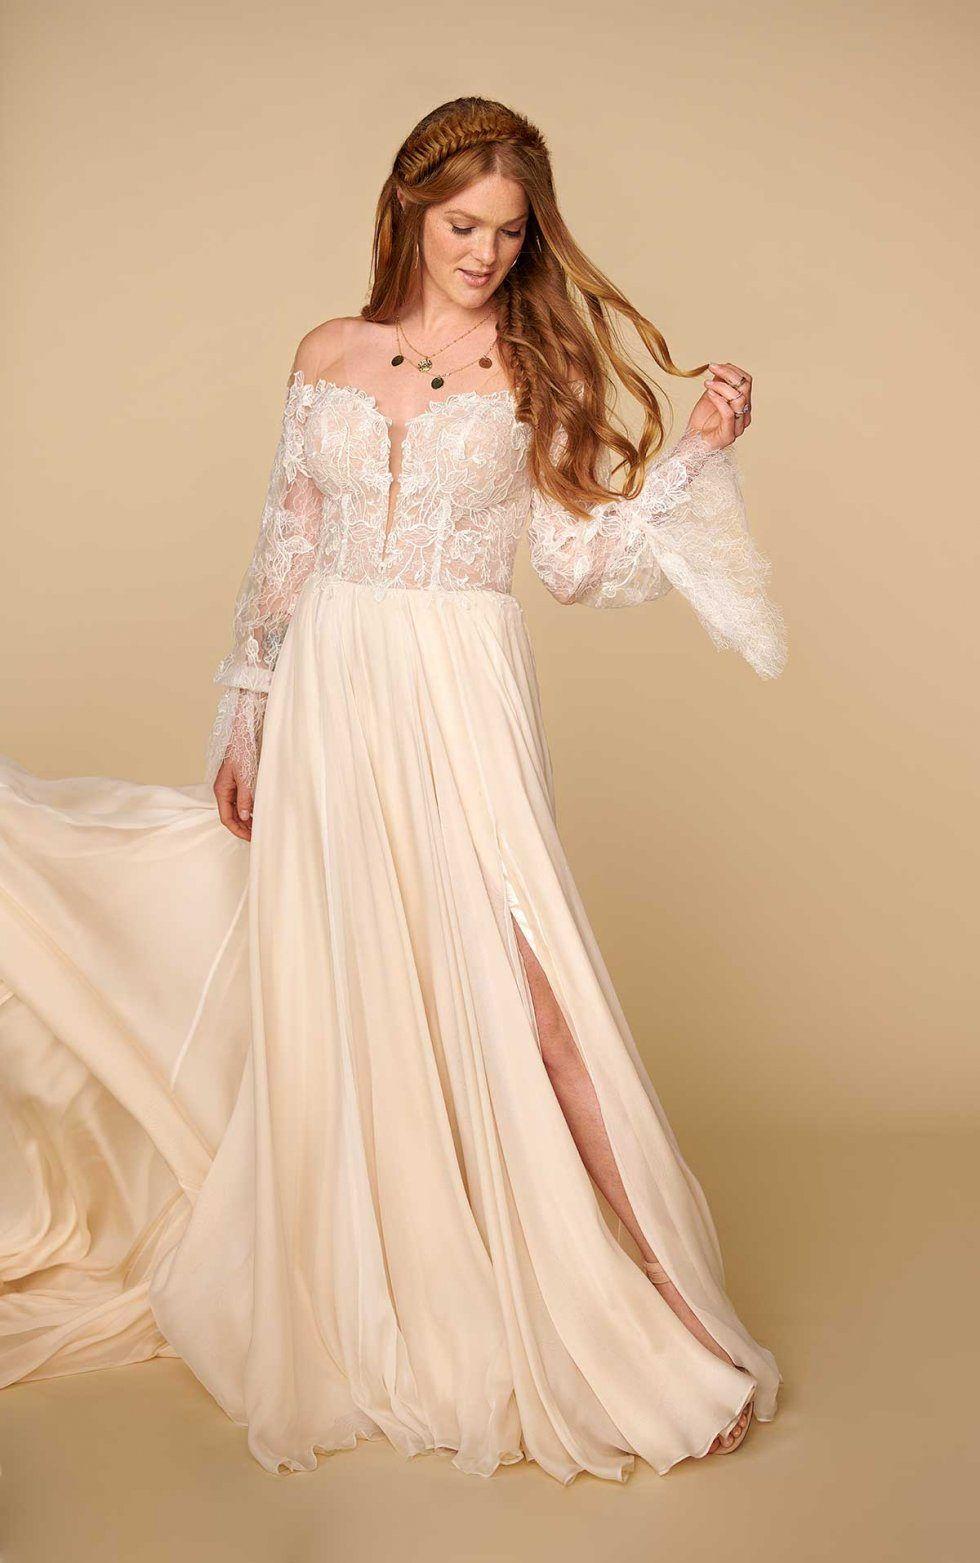 Finn Wedding Dress All Who Wander Boho Chic Wedding Dress Chic Wedding Dresses Bohemian Chic Weddings [ 1563 x 980 Pixel ]